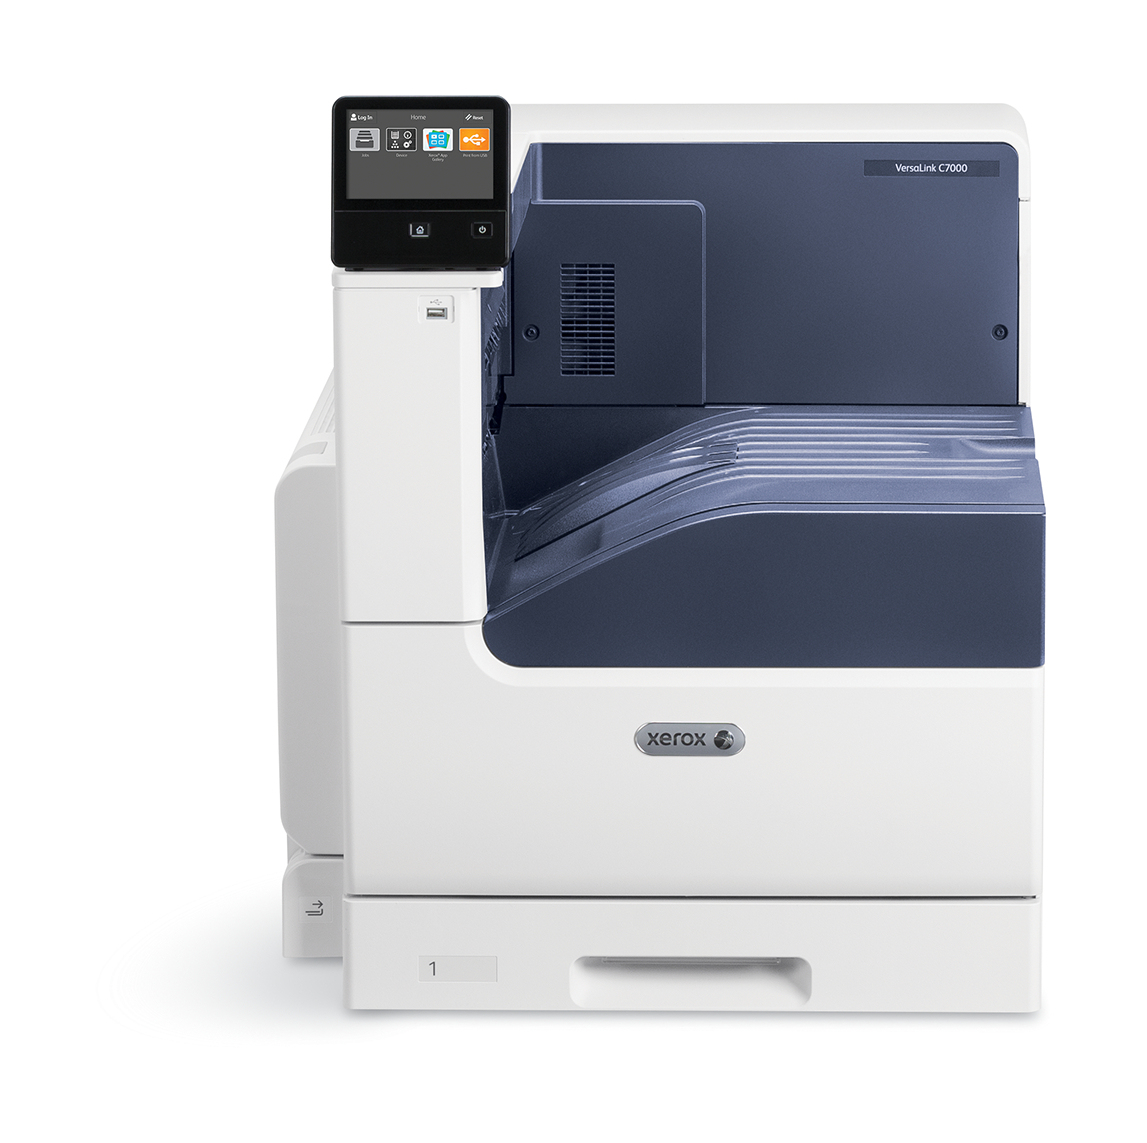 Xerox VersaLink C7000V_N Laser-Drucker Farbe 1200 x 2400 DPI A3